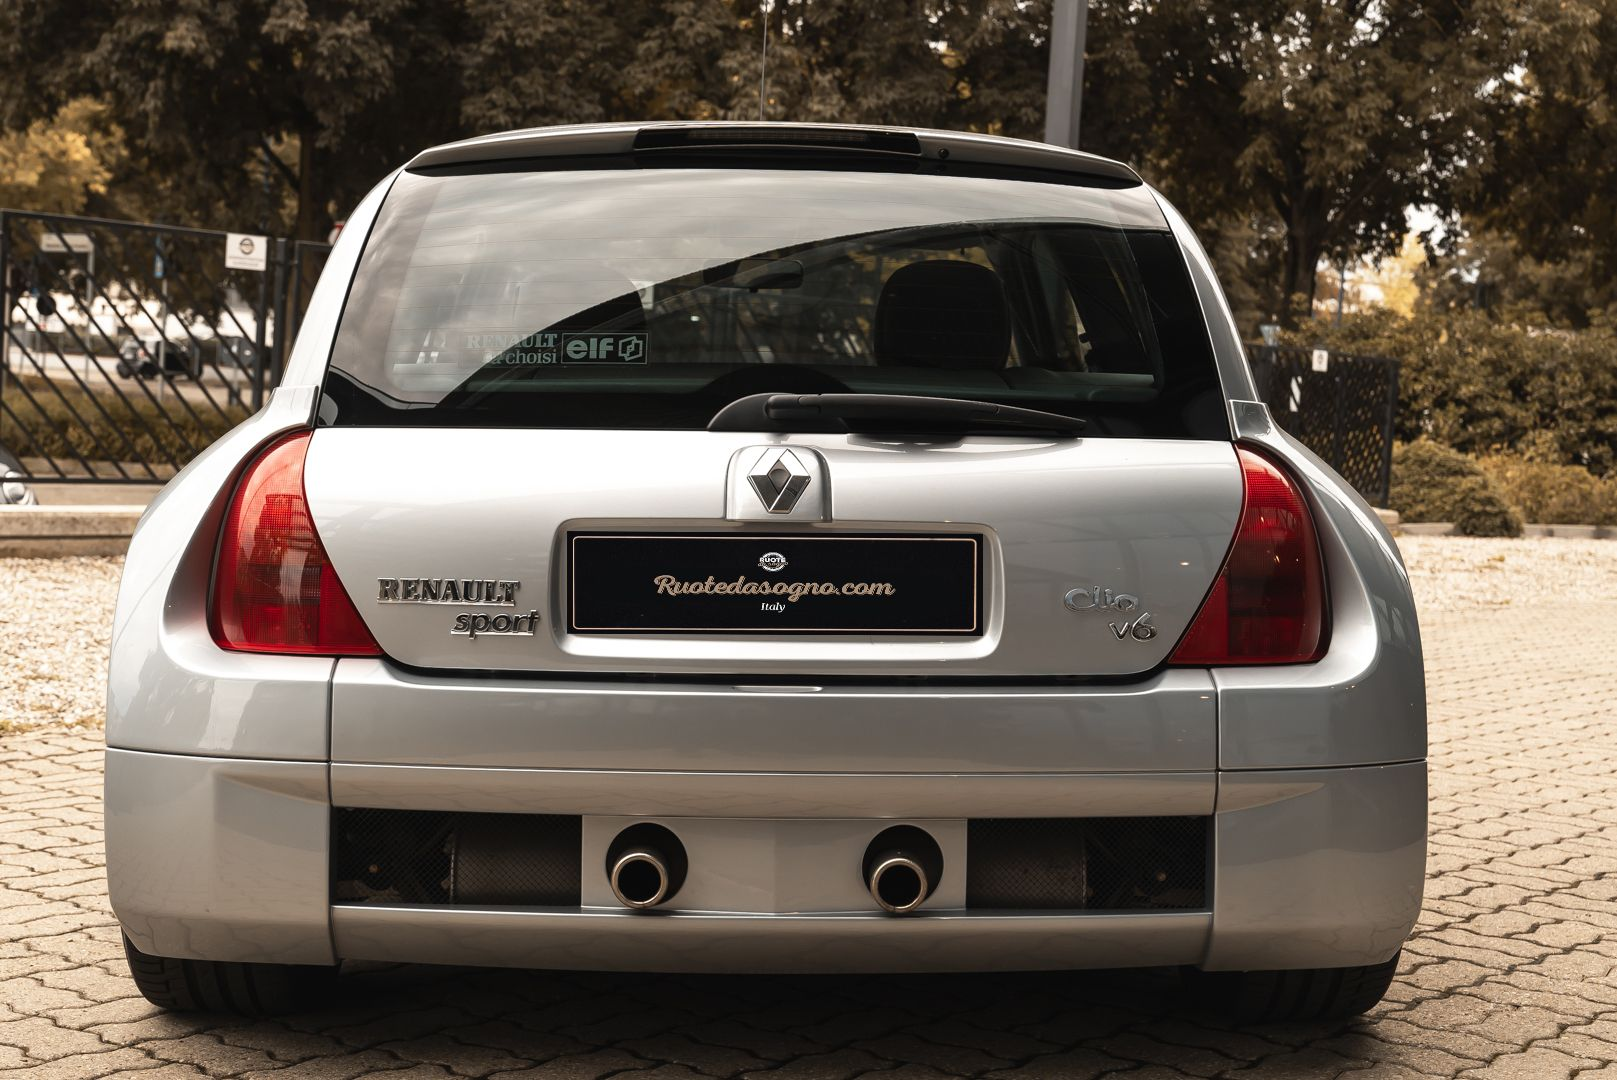 2002 Renault Clio 3.0 V6 Renault Sport Phase1 84925